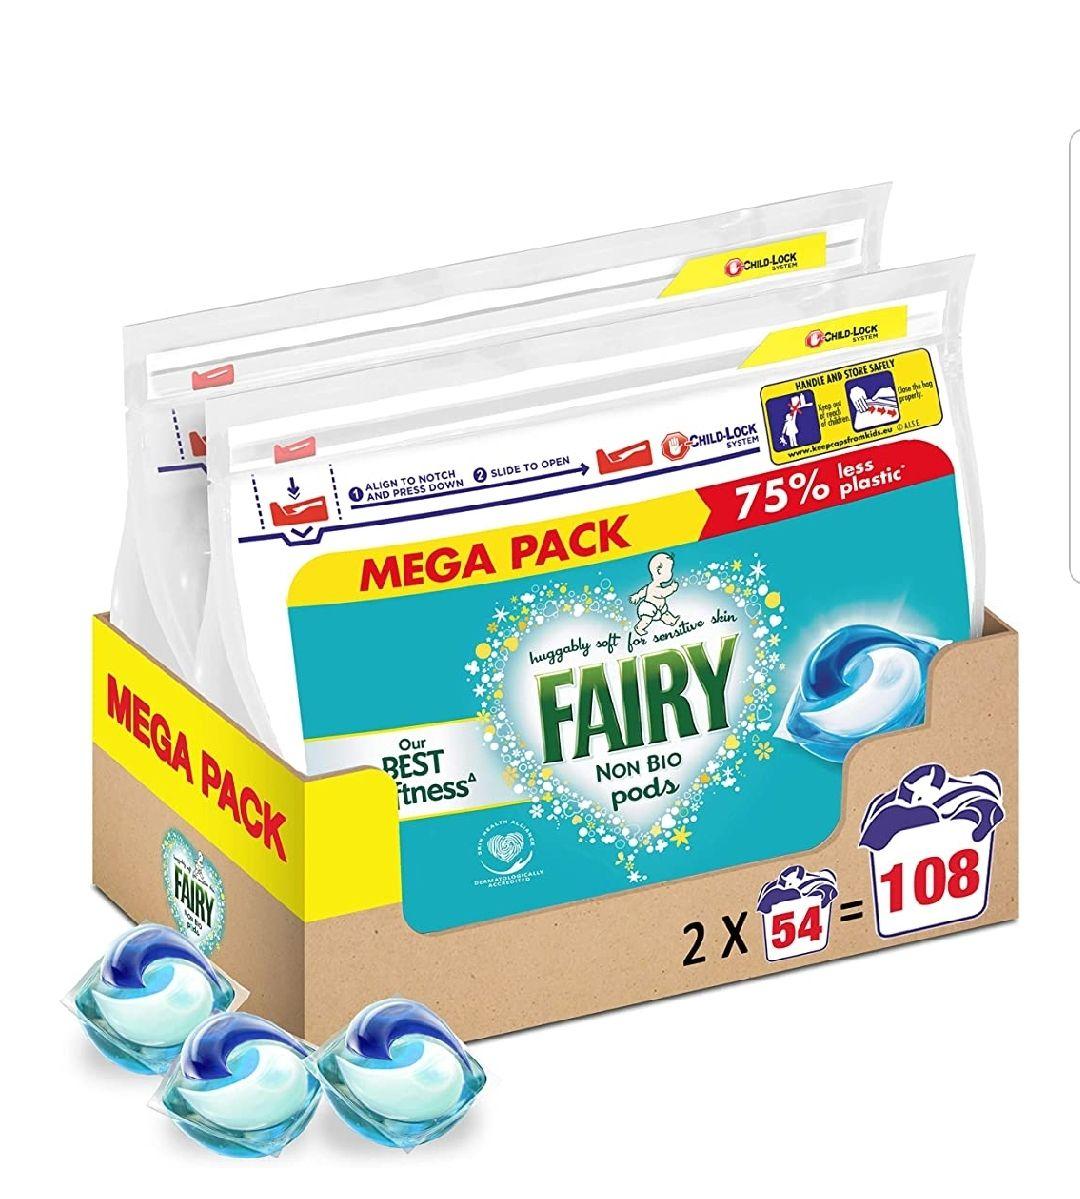 Fairy Non-Bio Pods Washing Liquid Laundry Detergent 108 Washes (54 x 2) £19.06 prime / £23.55 nonPrime / 18.11 s&s at Amazon